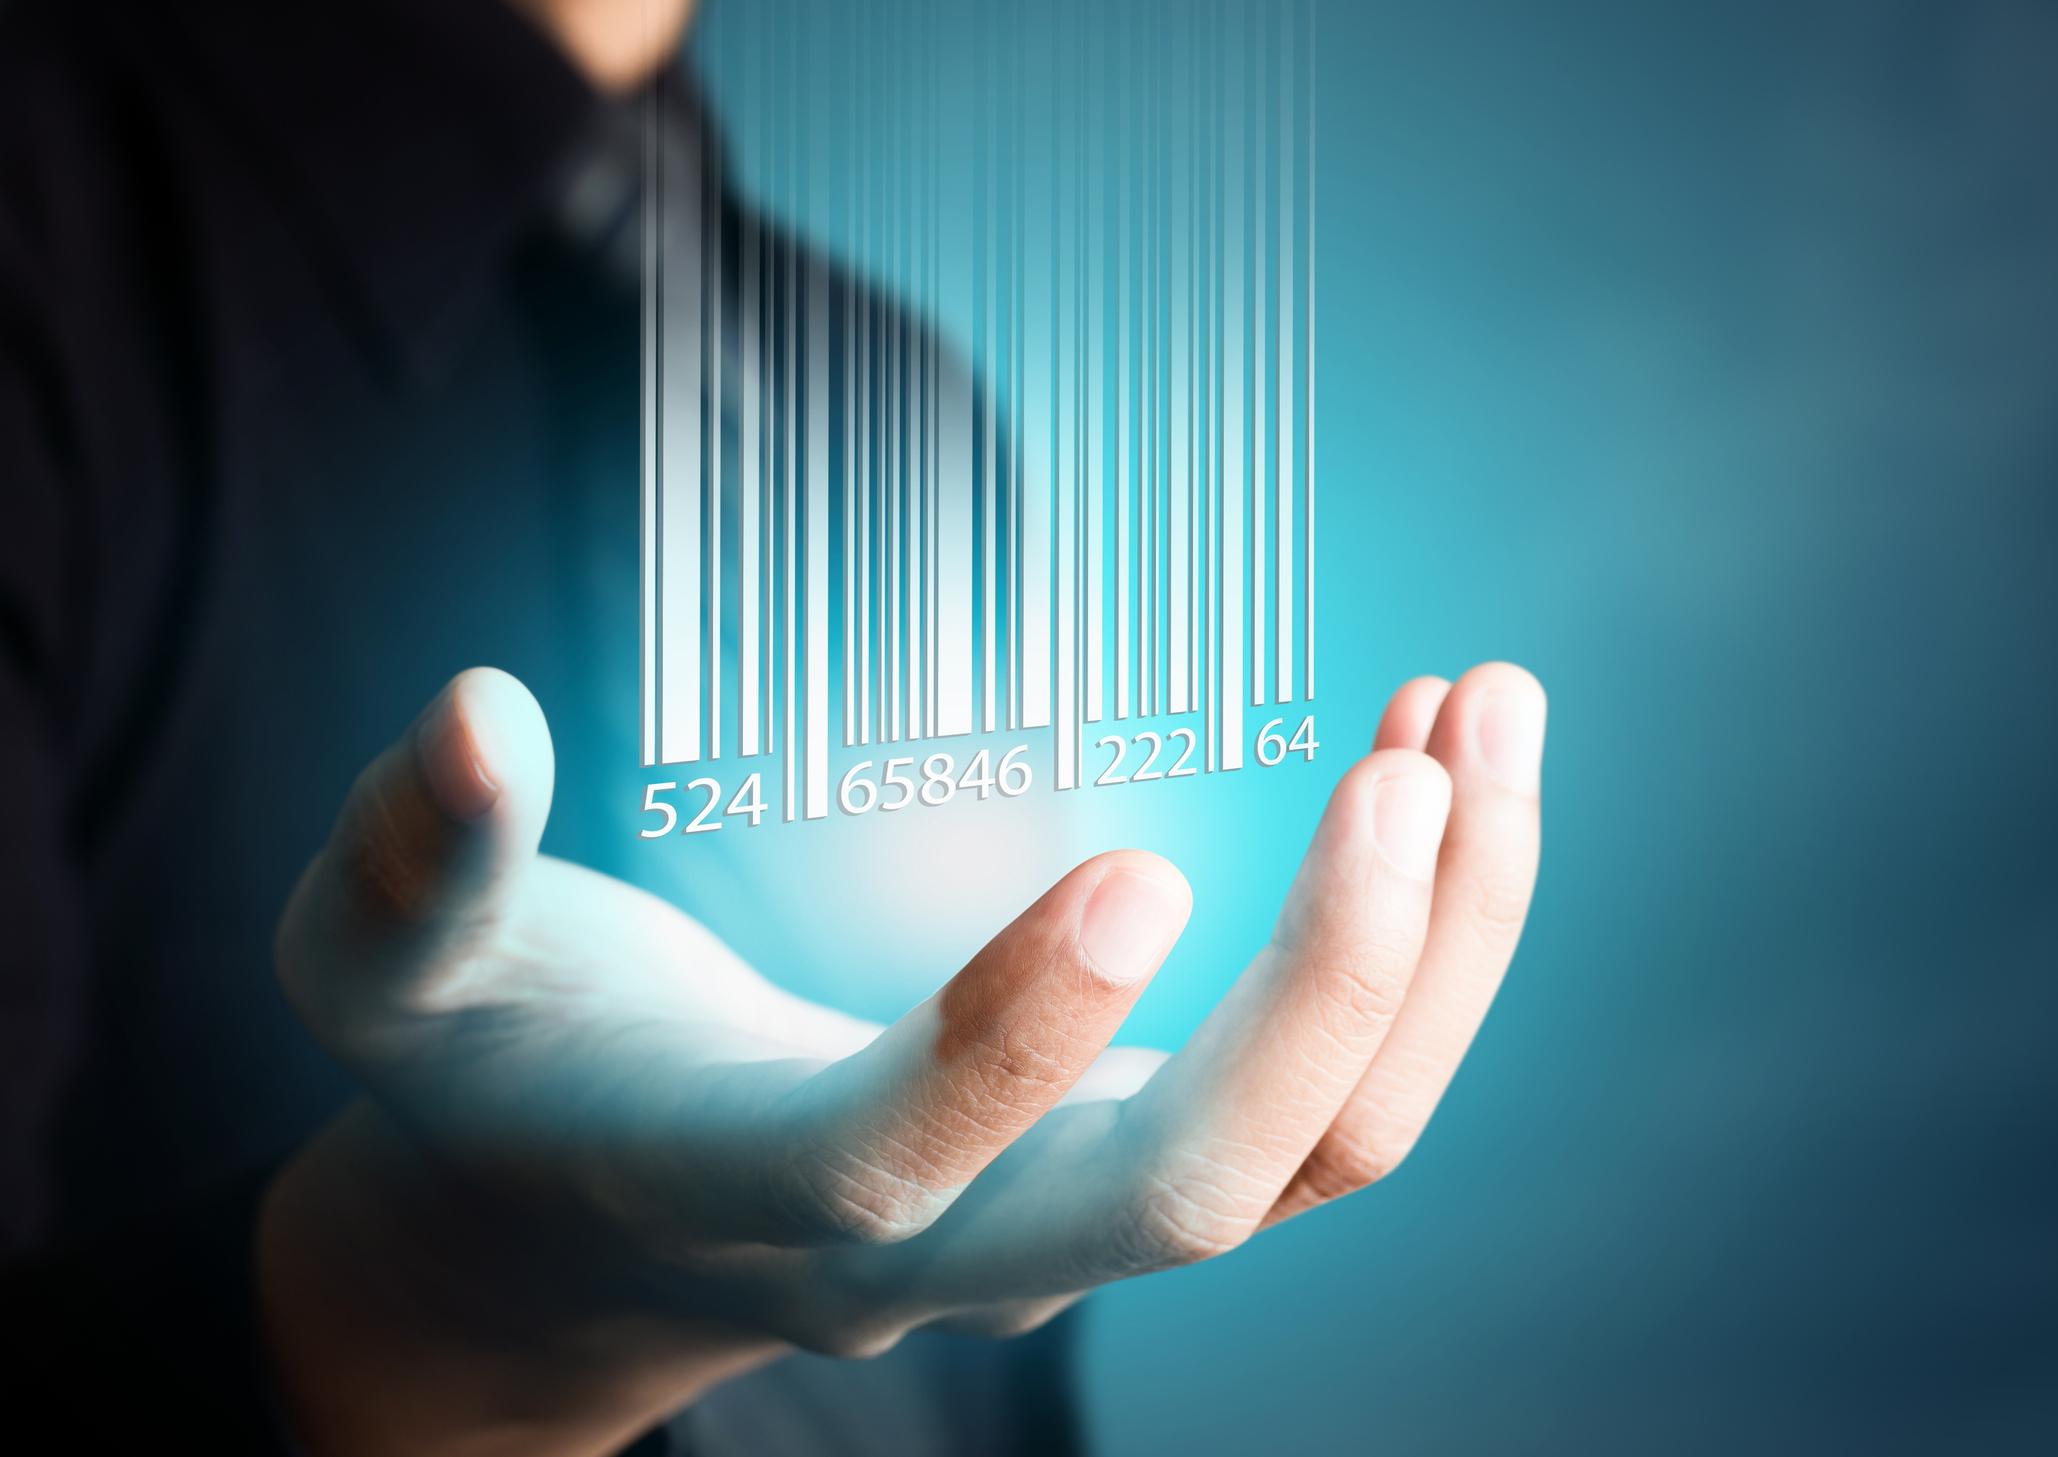 Hand grasping digital representation of barcode